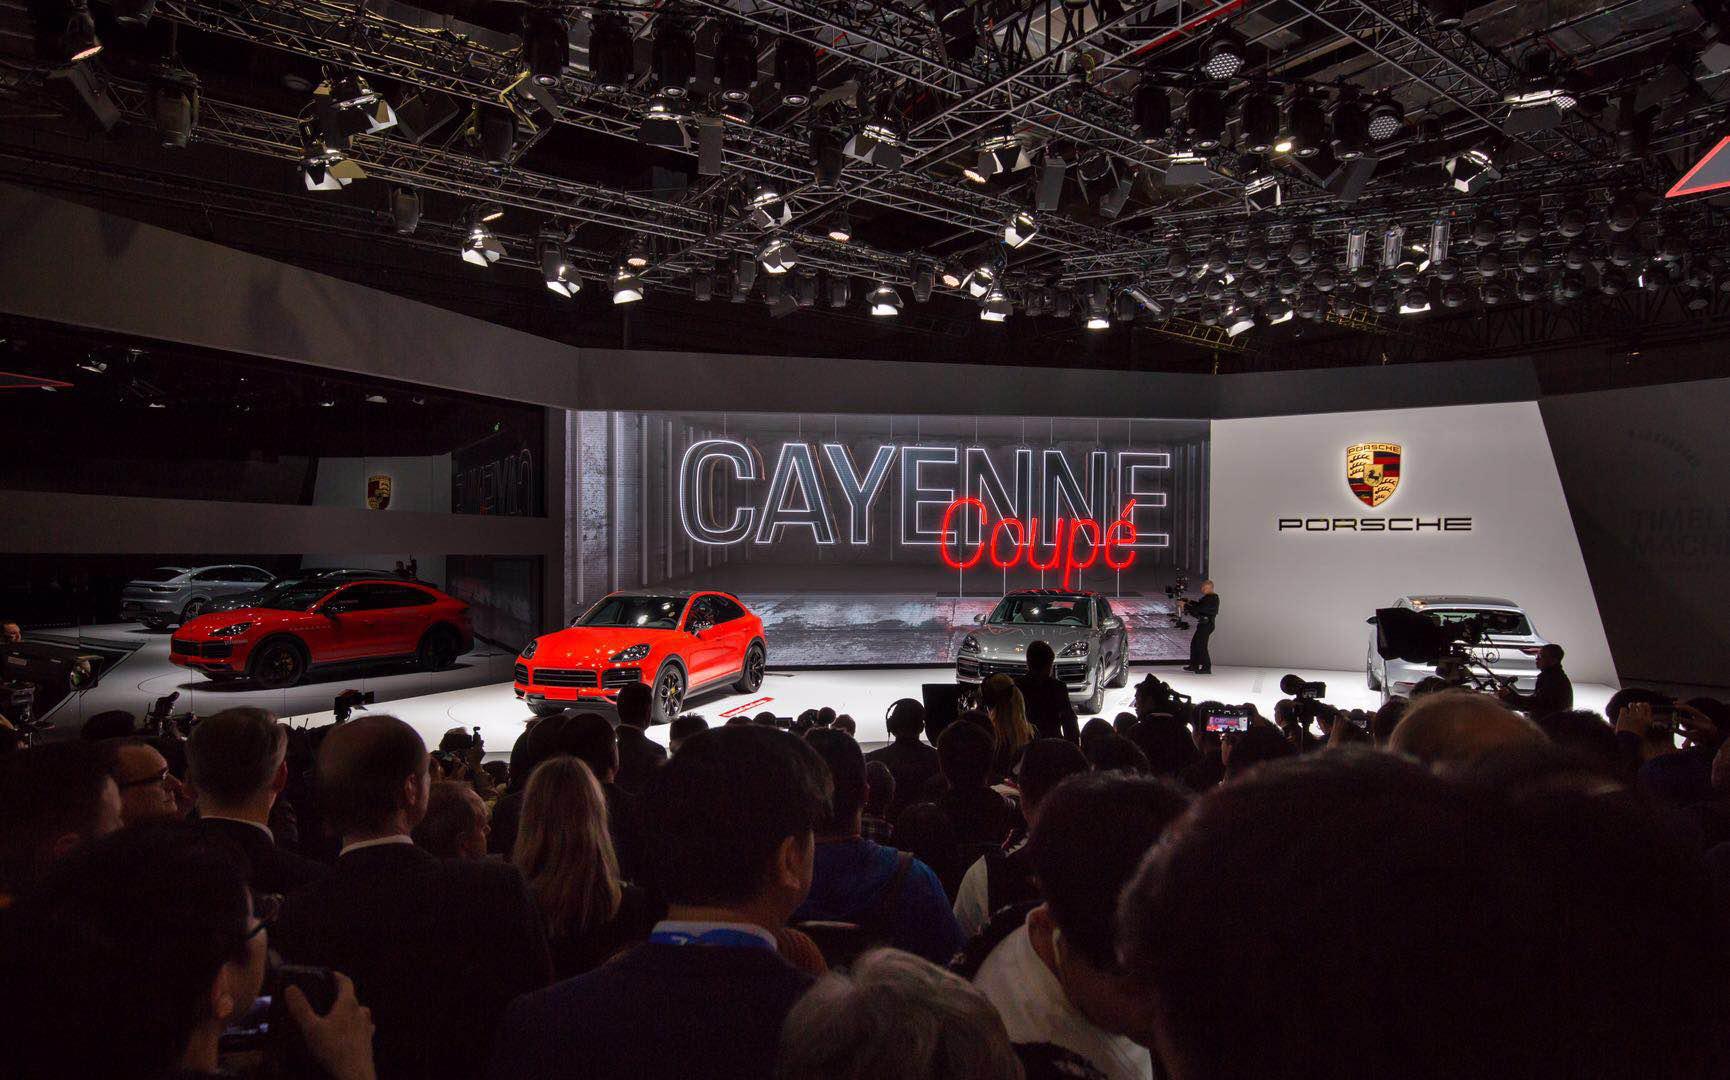 Cayenne Coupe和全新911,8.1豪车馆中最棒的收获